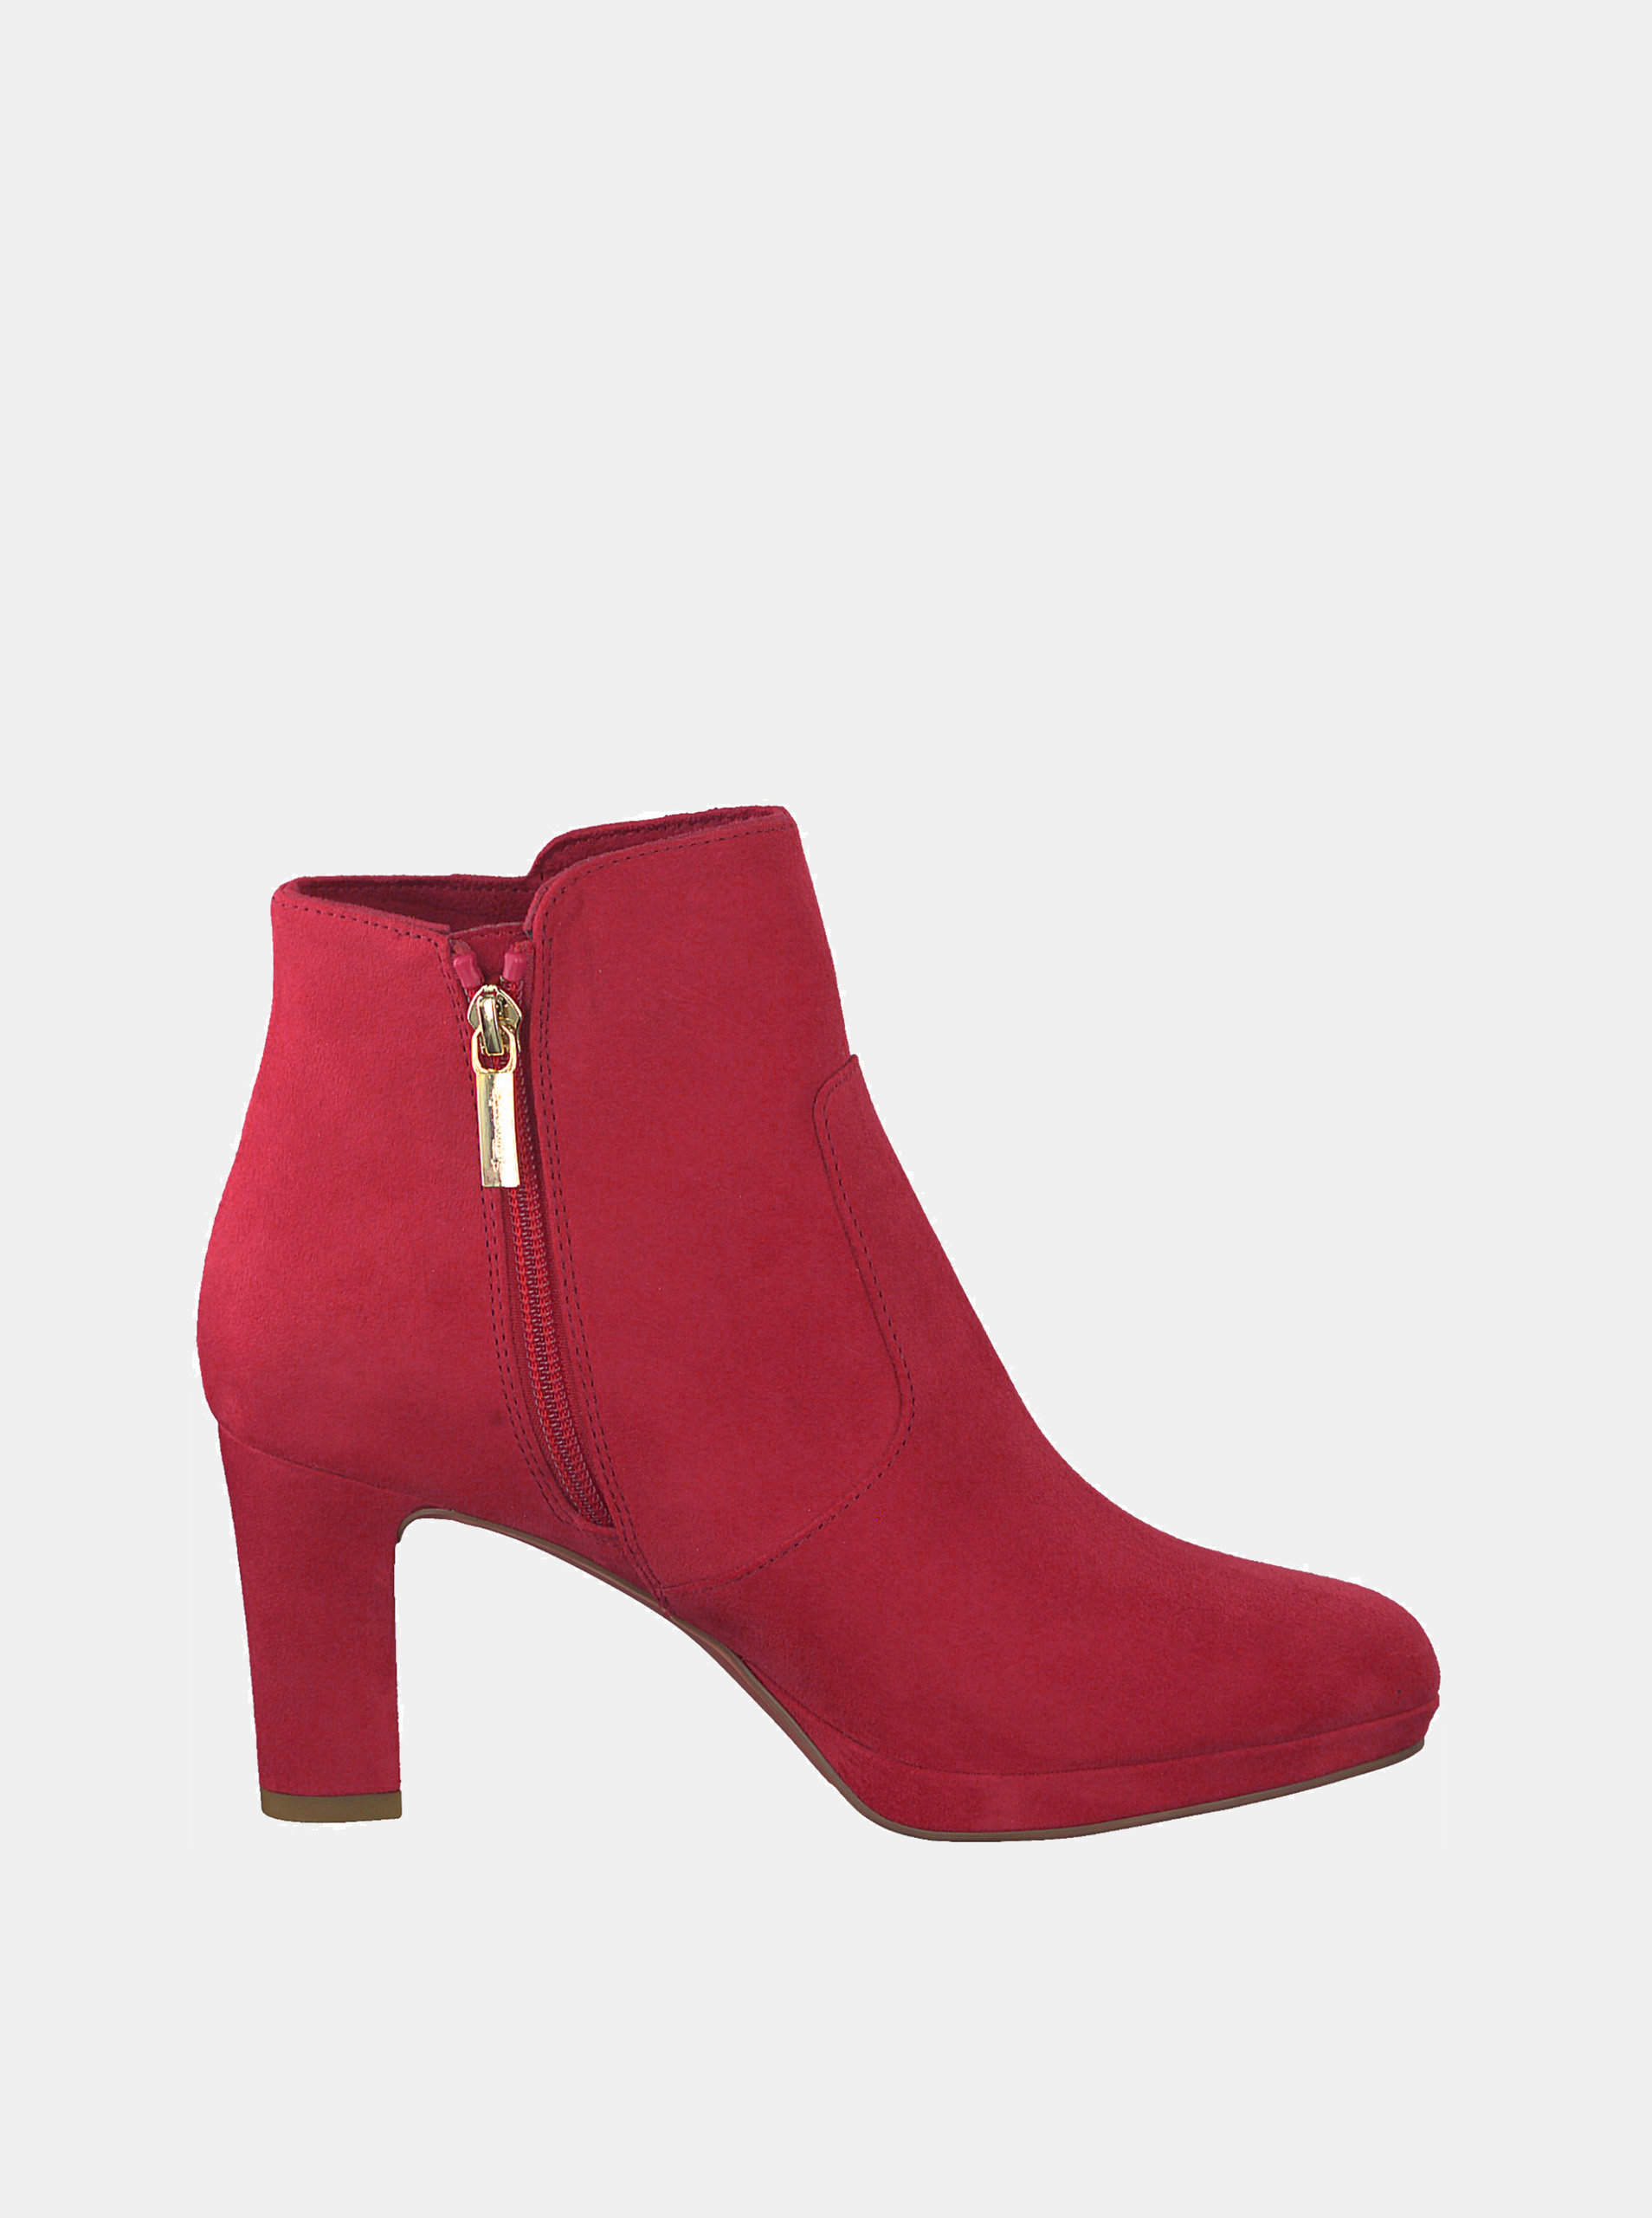 04bac811e0bce Červené členkové topánky v semišovej úprave Tamaris Maura | ZOOT.sk